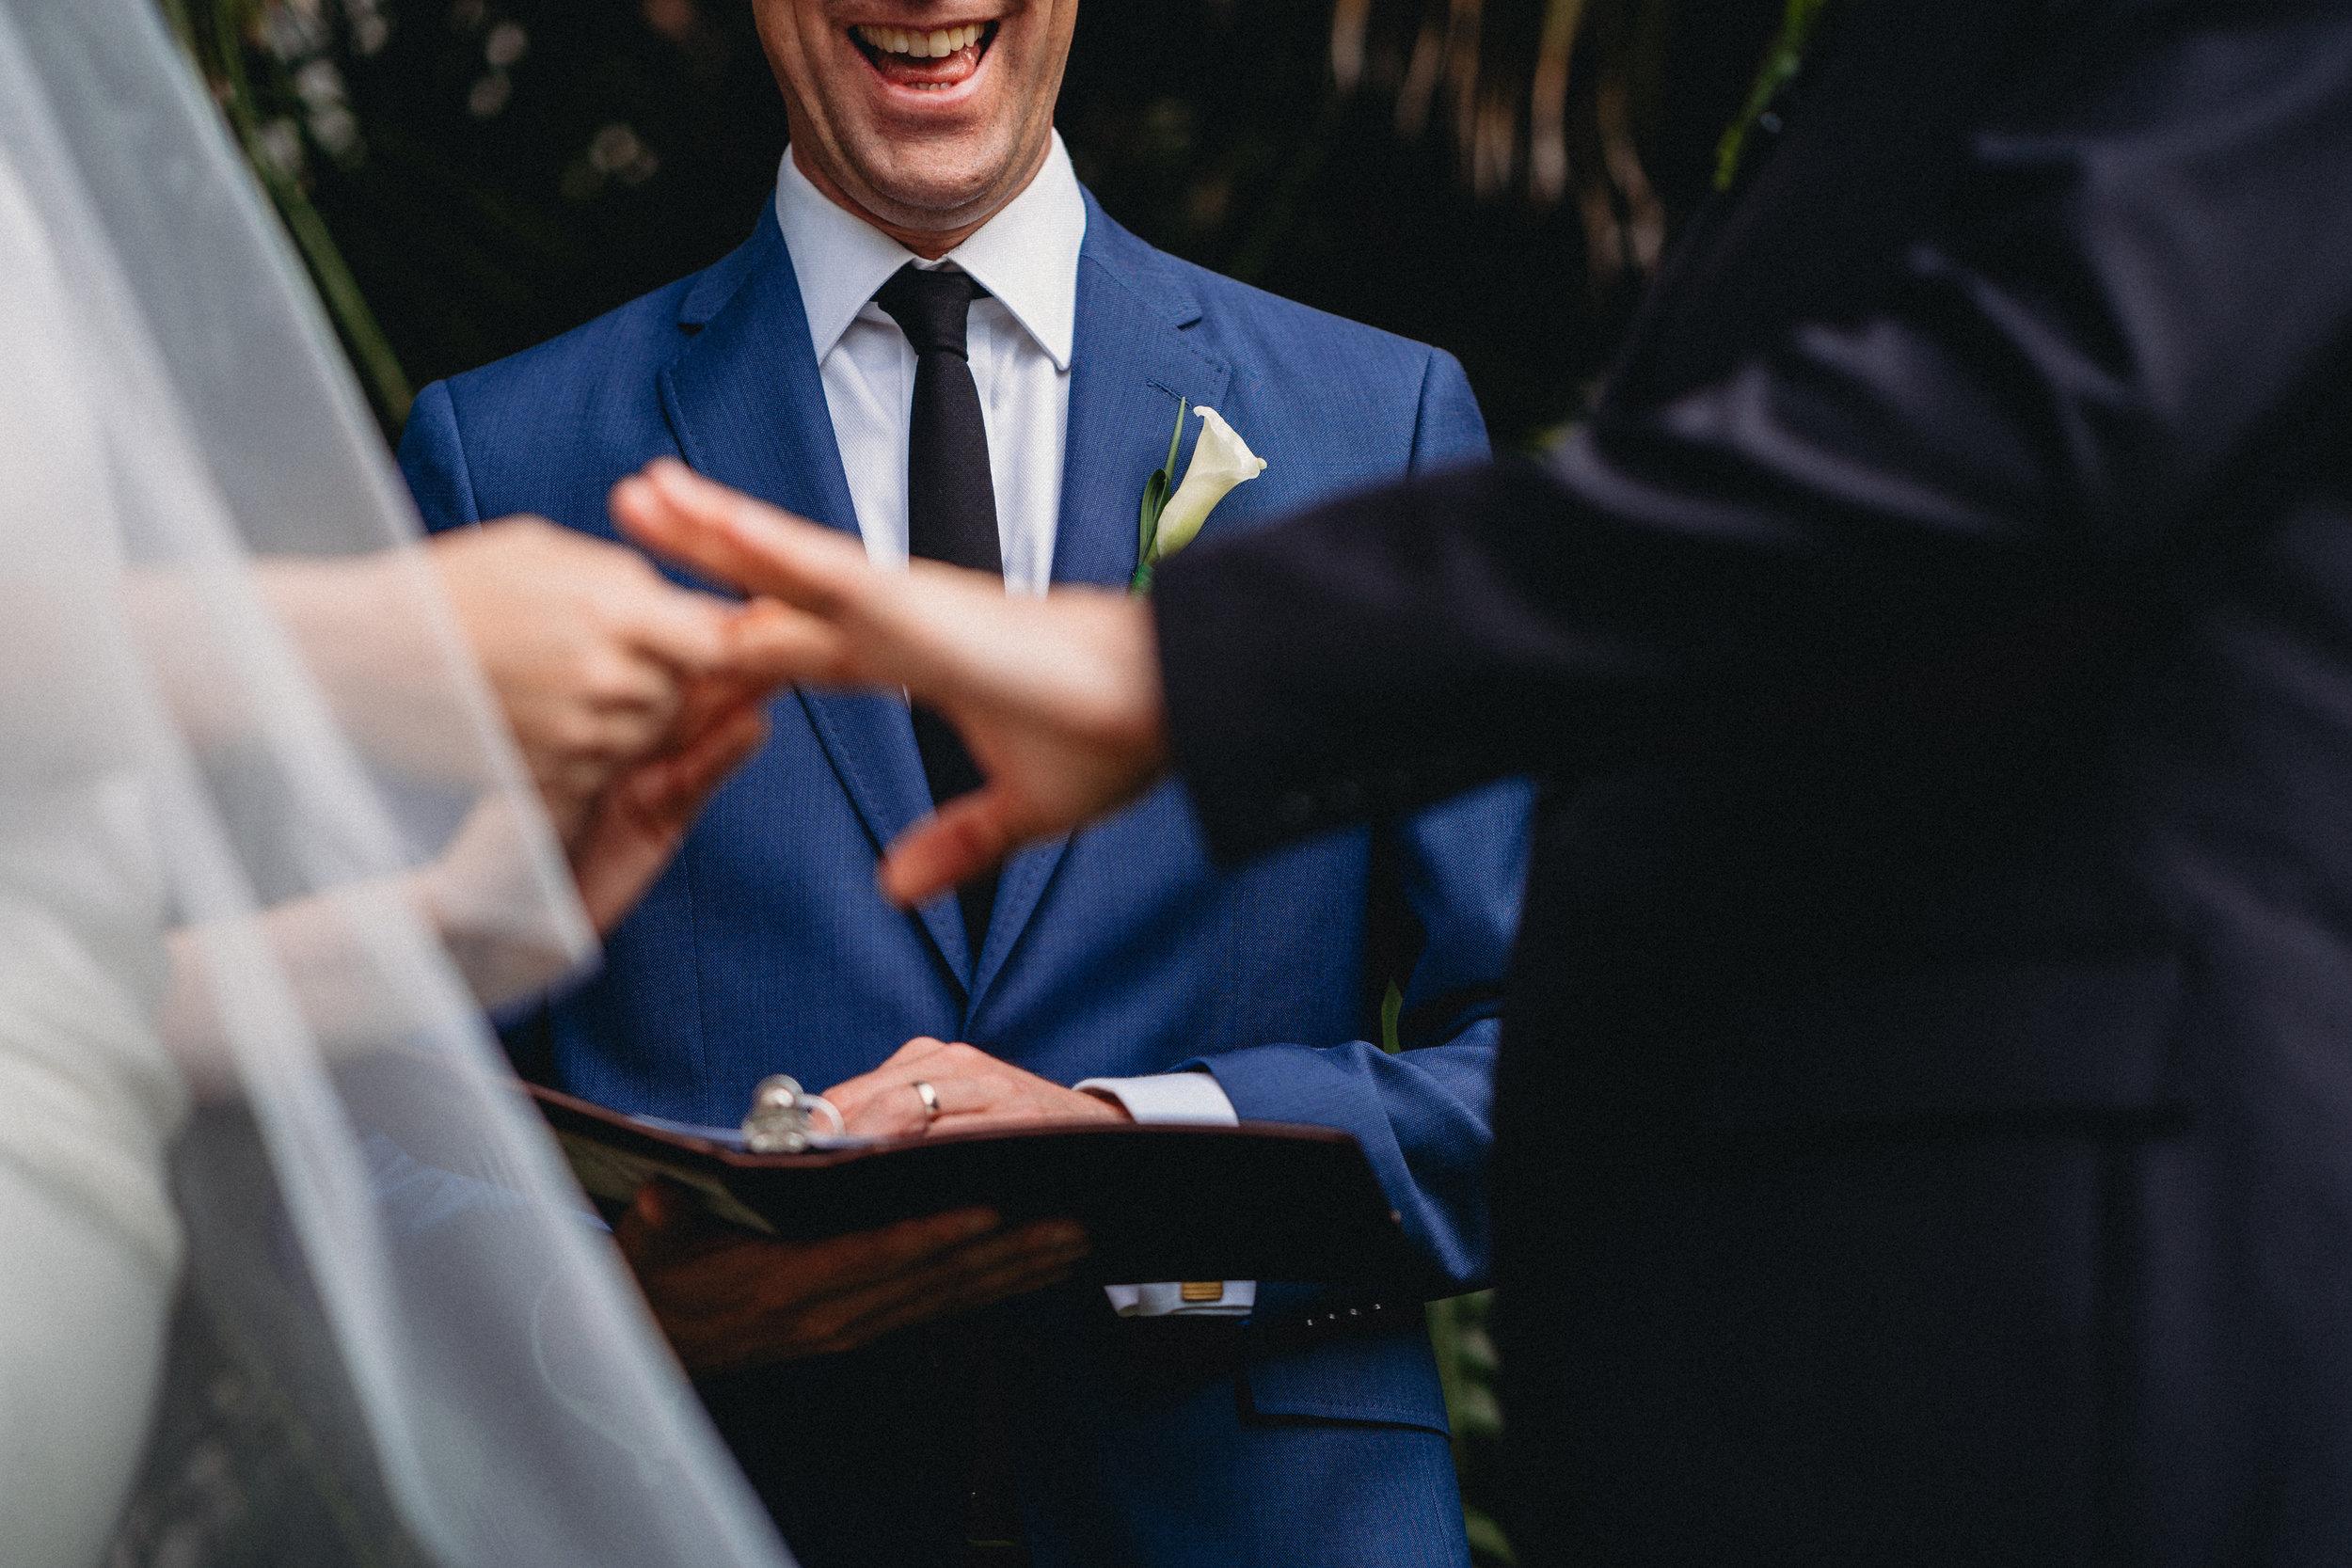 wedding-photography-santa-barbara-courthouse-rebeccaylasotras-88.jpg